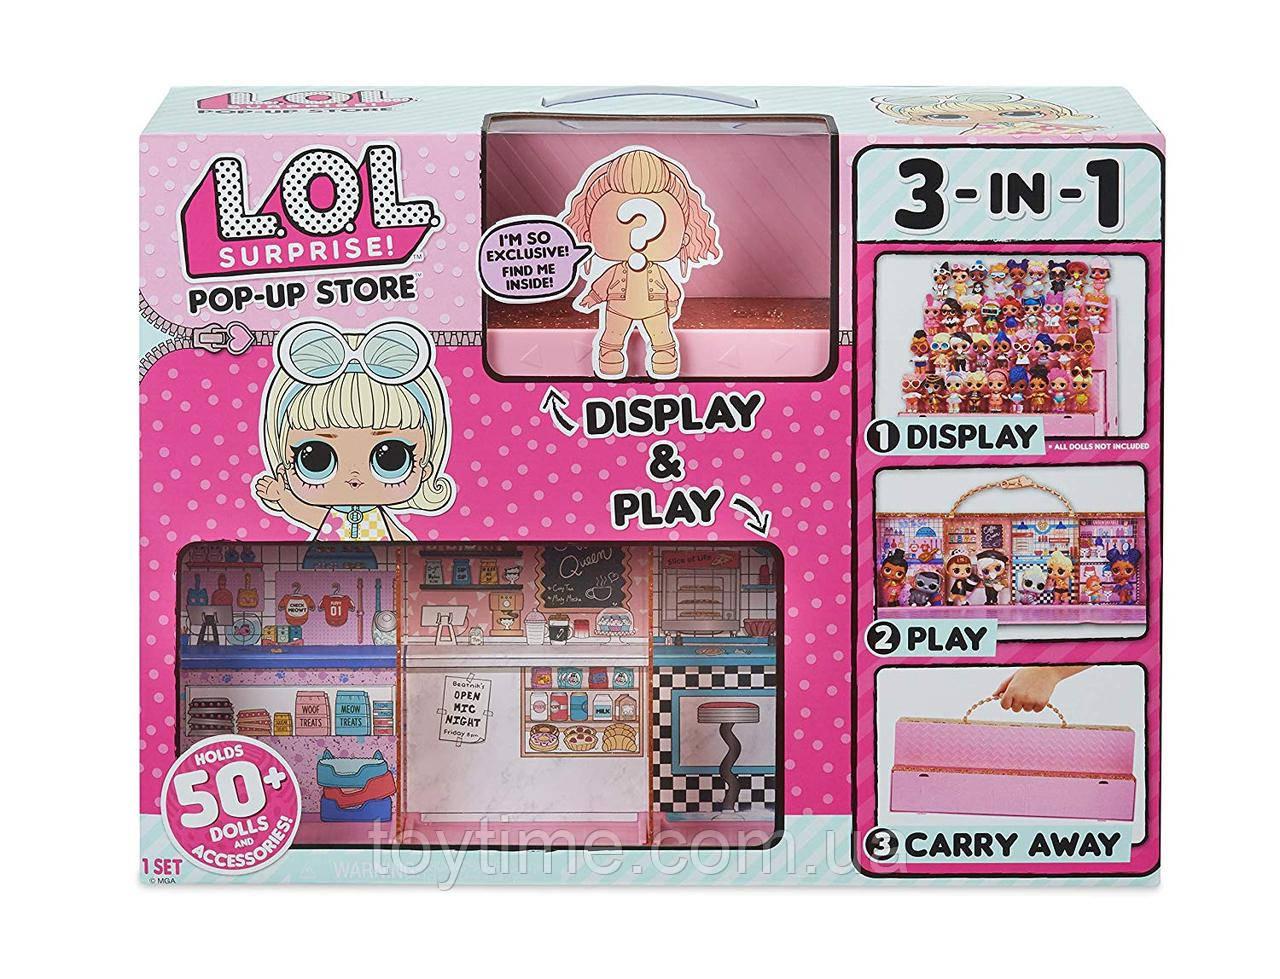 L.O.L. Подиум / L.O.L. Surprise! Pop-Up Store